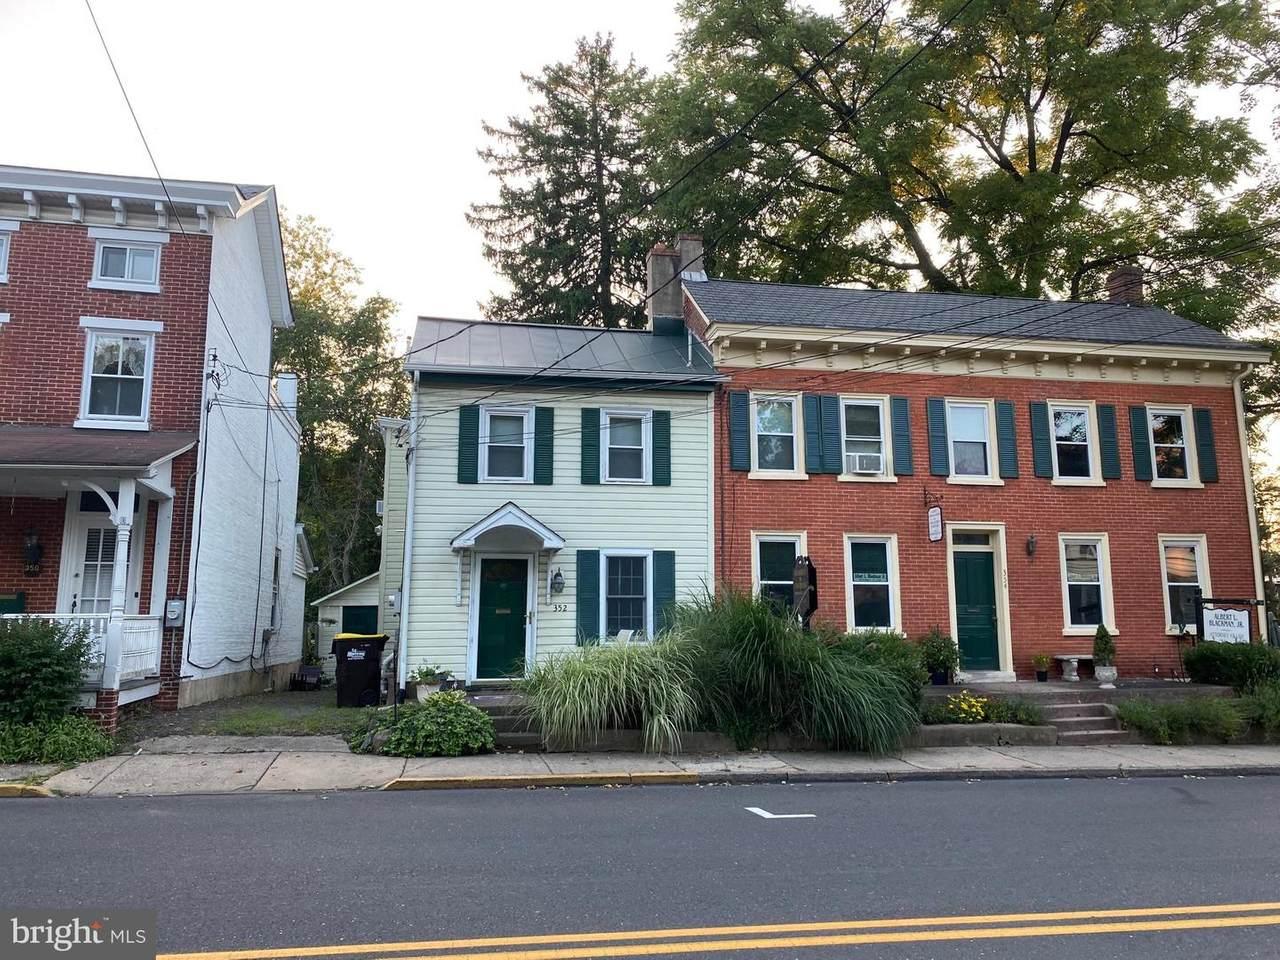 352 Main Street - Photo 1